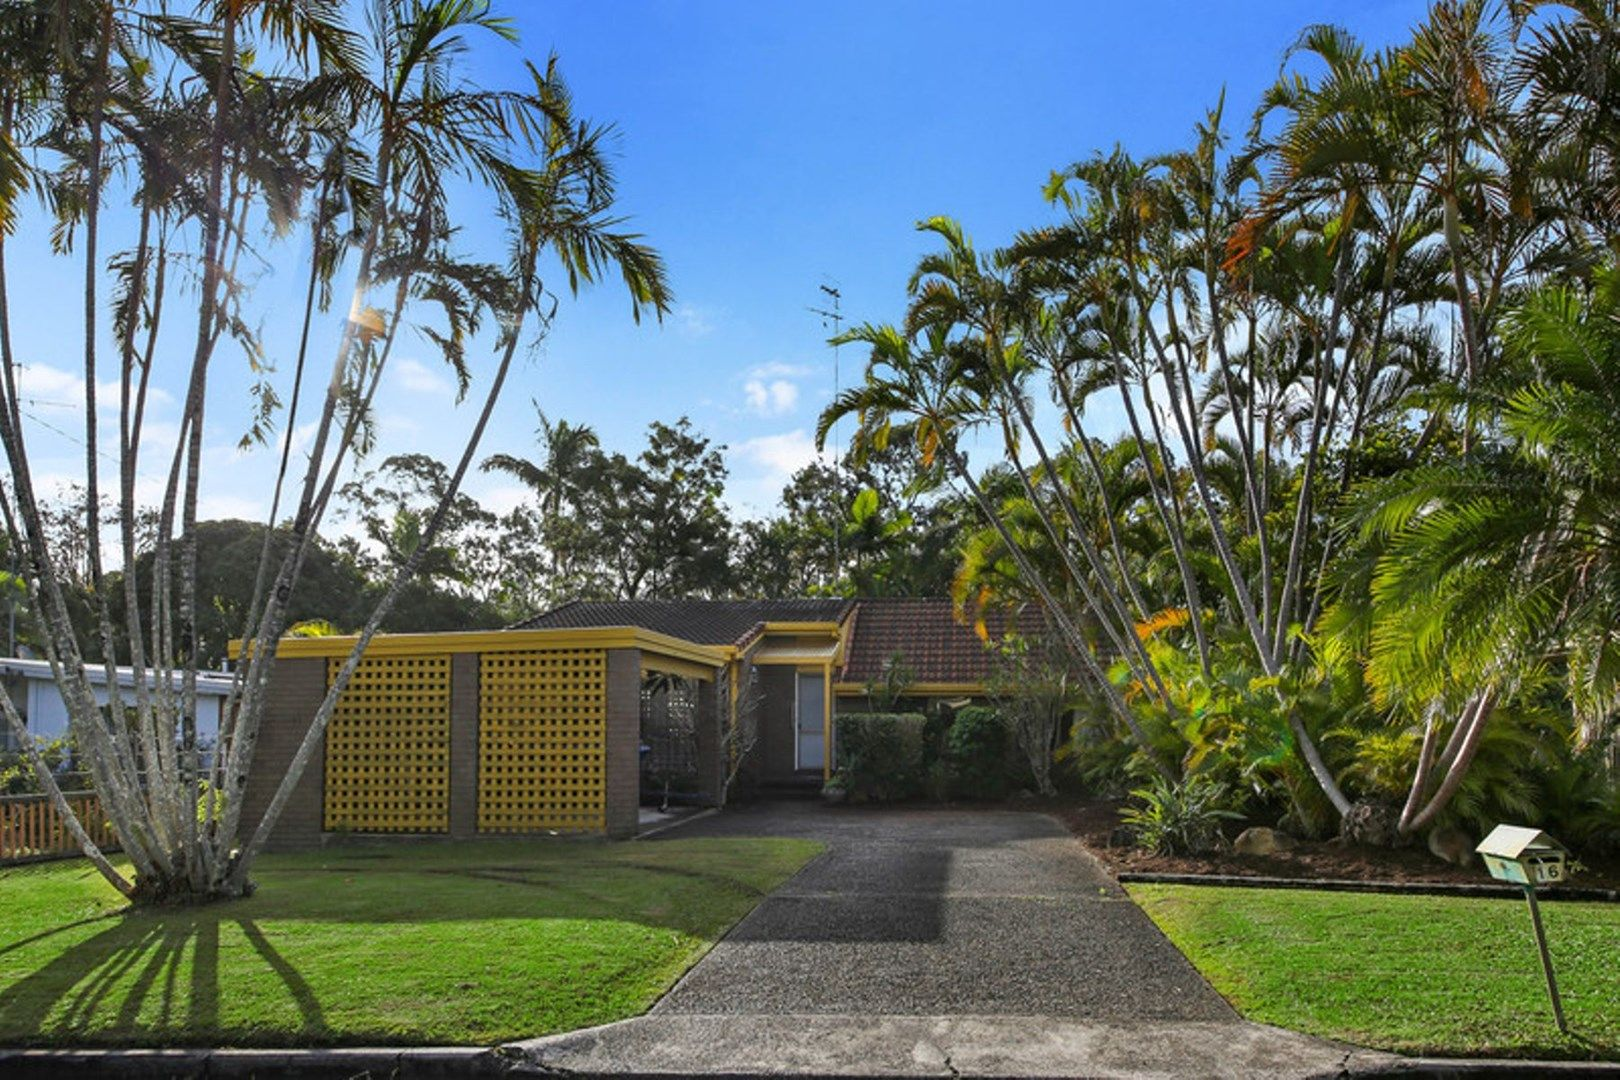 16 Weyba Park Drive, Noosa Heads QLD 4567, Image 0